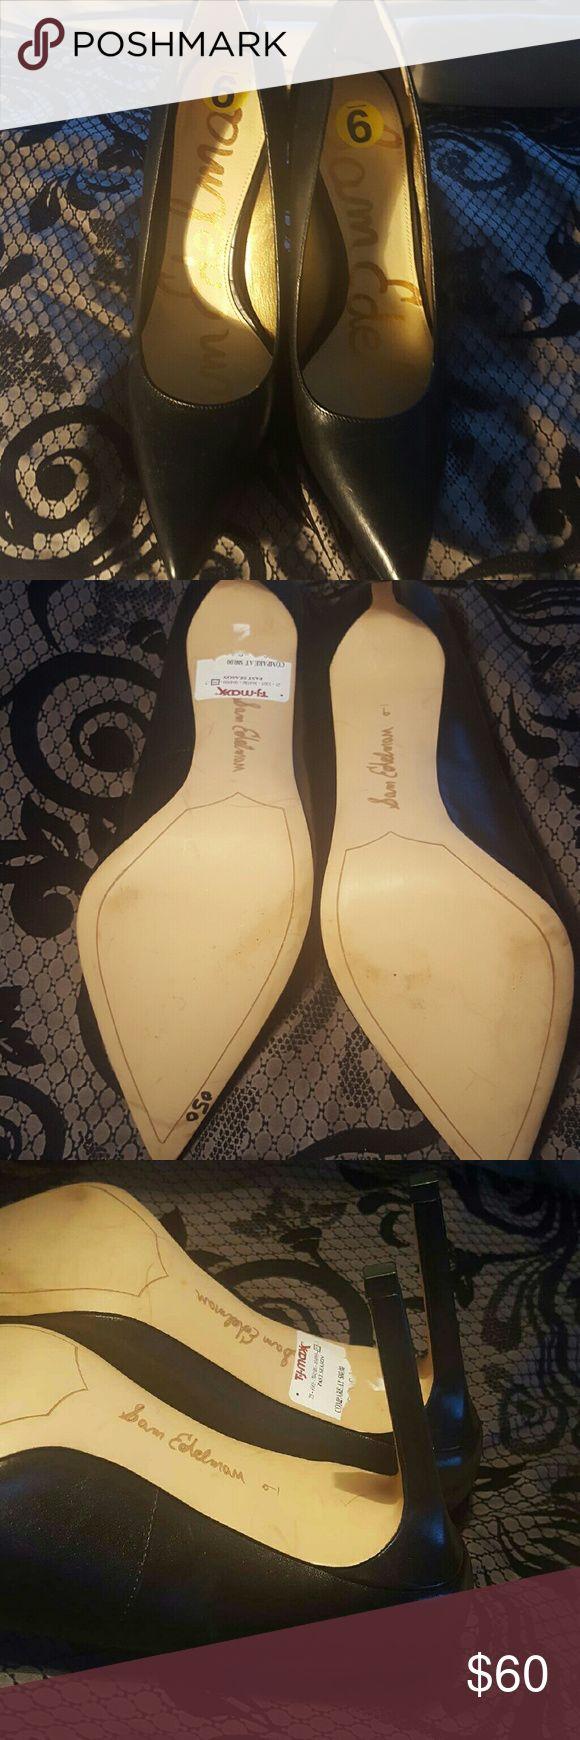 Size 9 Sam Edelman Heels Only worn once Sam Edelman Shoes Heels